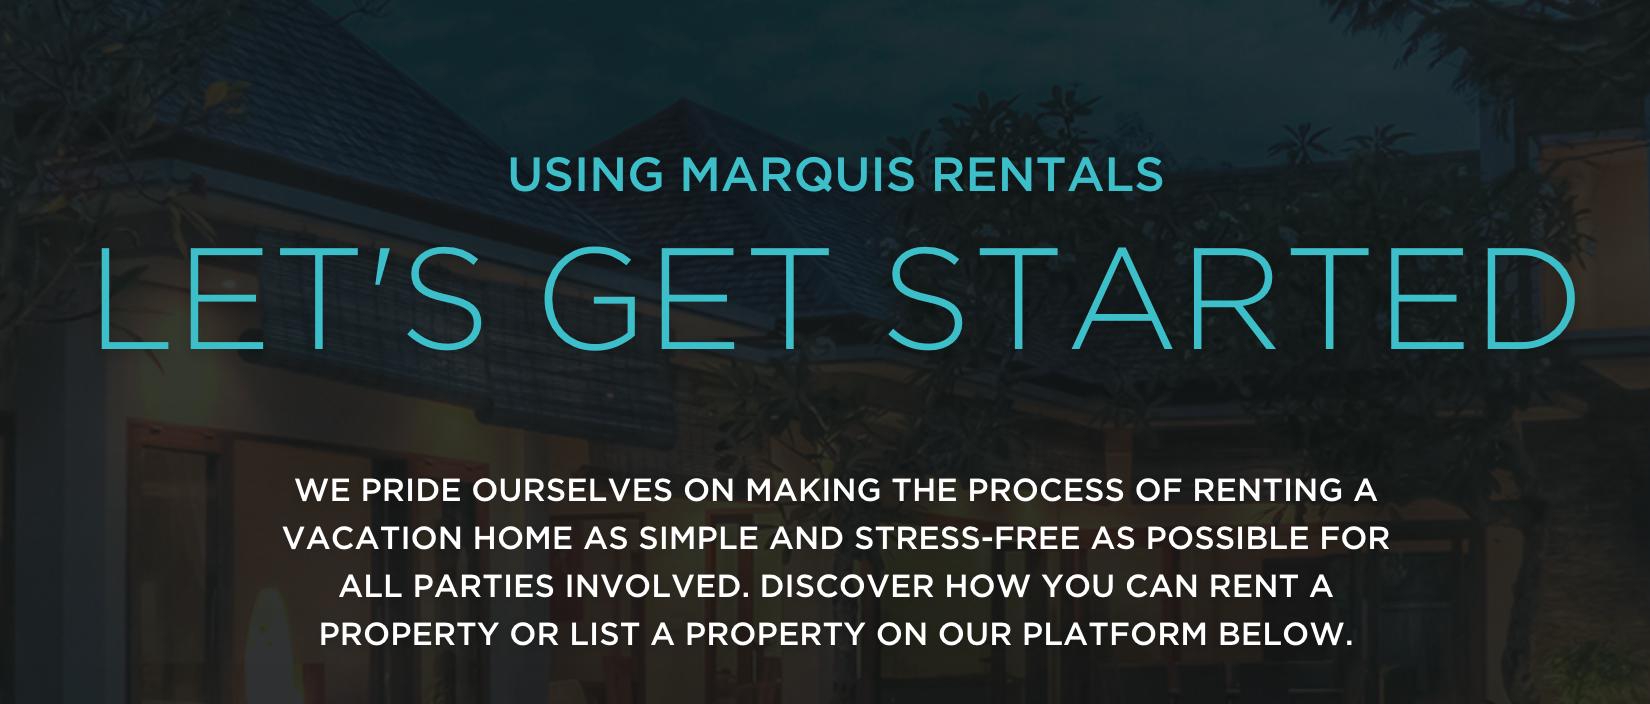 Marquis website image